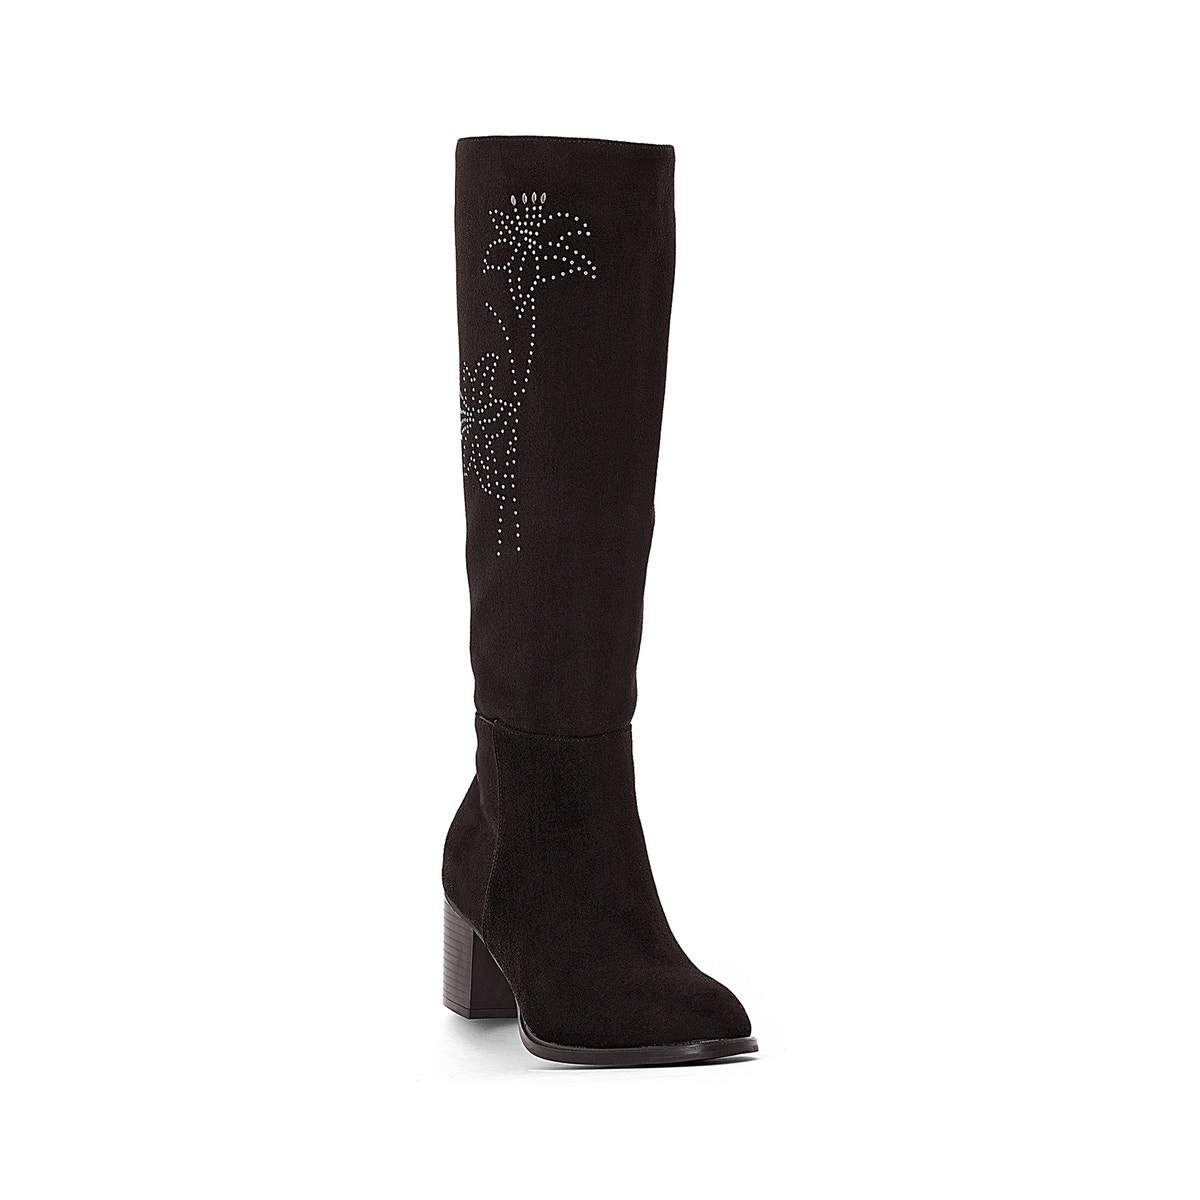 La ROToute Damenschuhe Stiefel With With Stiefel Floral Motif 830e86